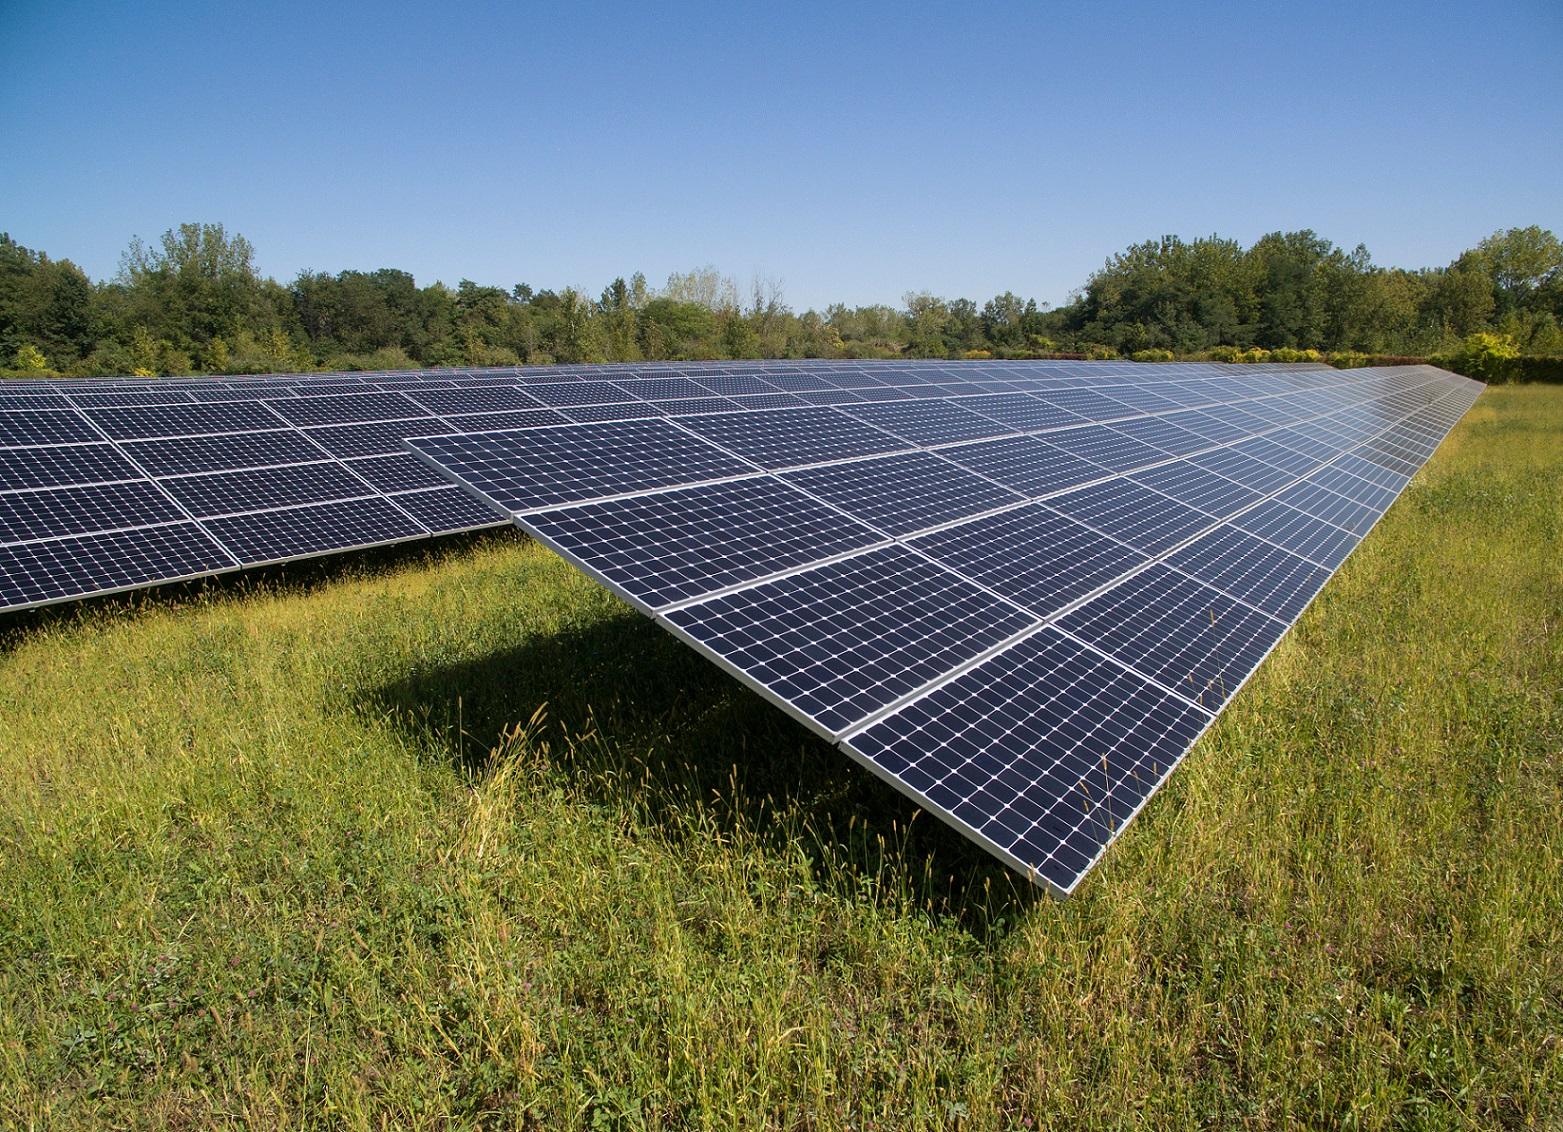 Solar power plant in a field.